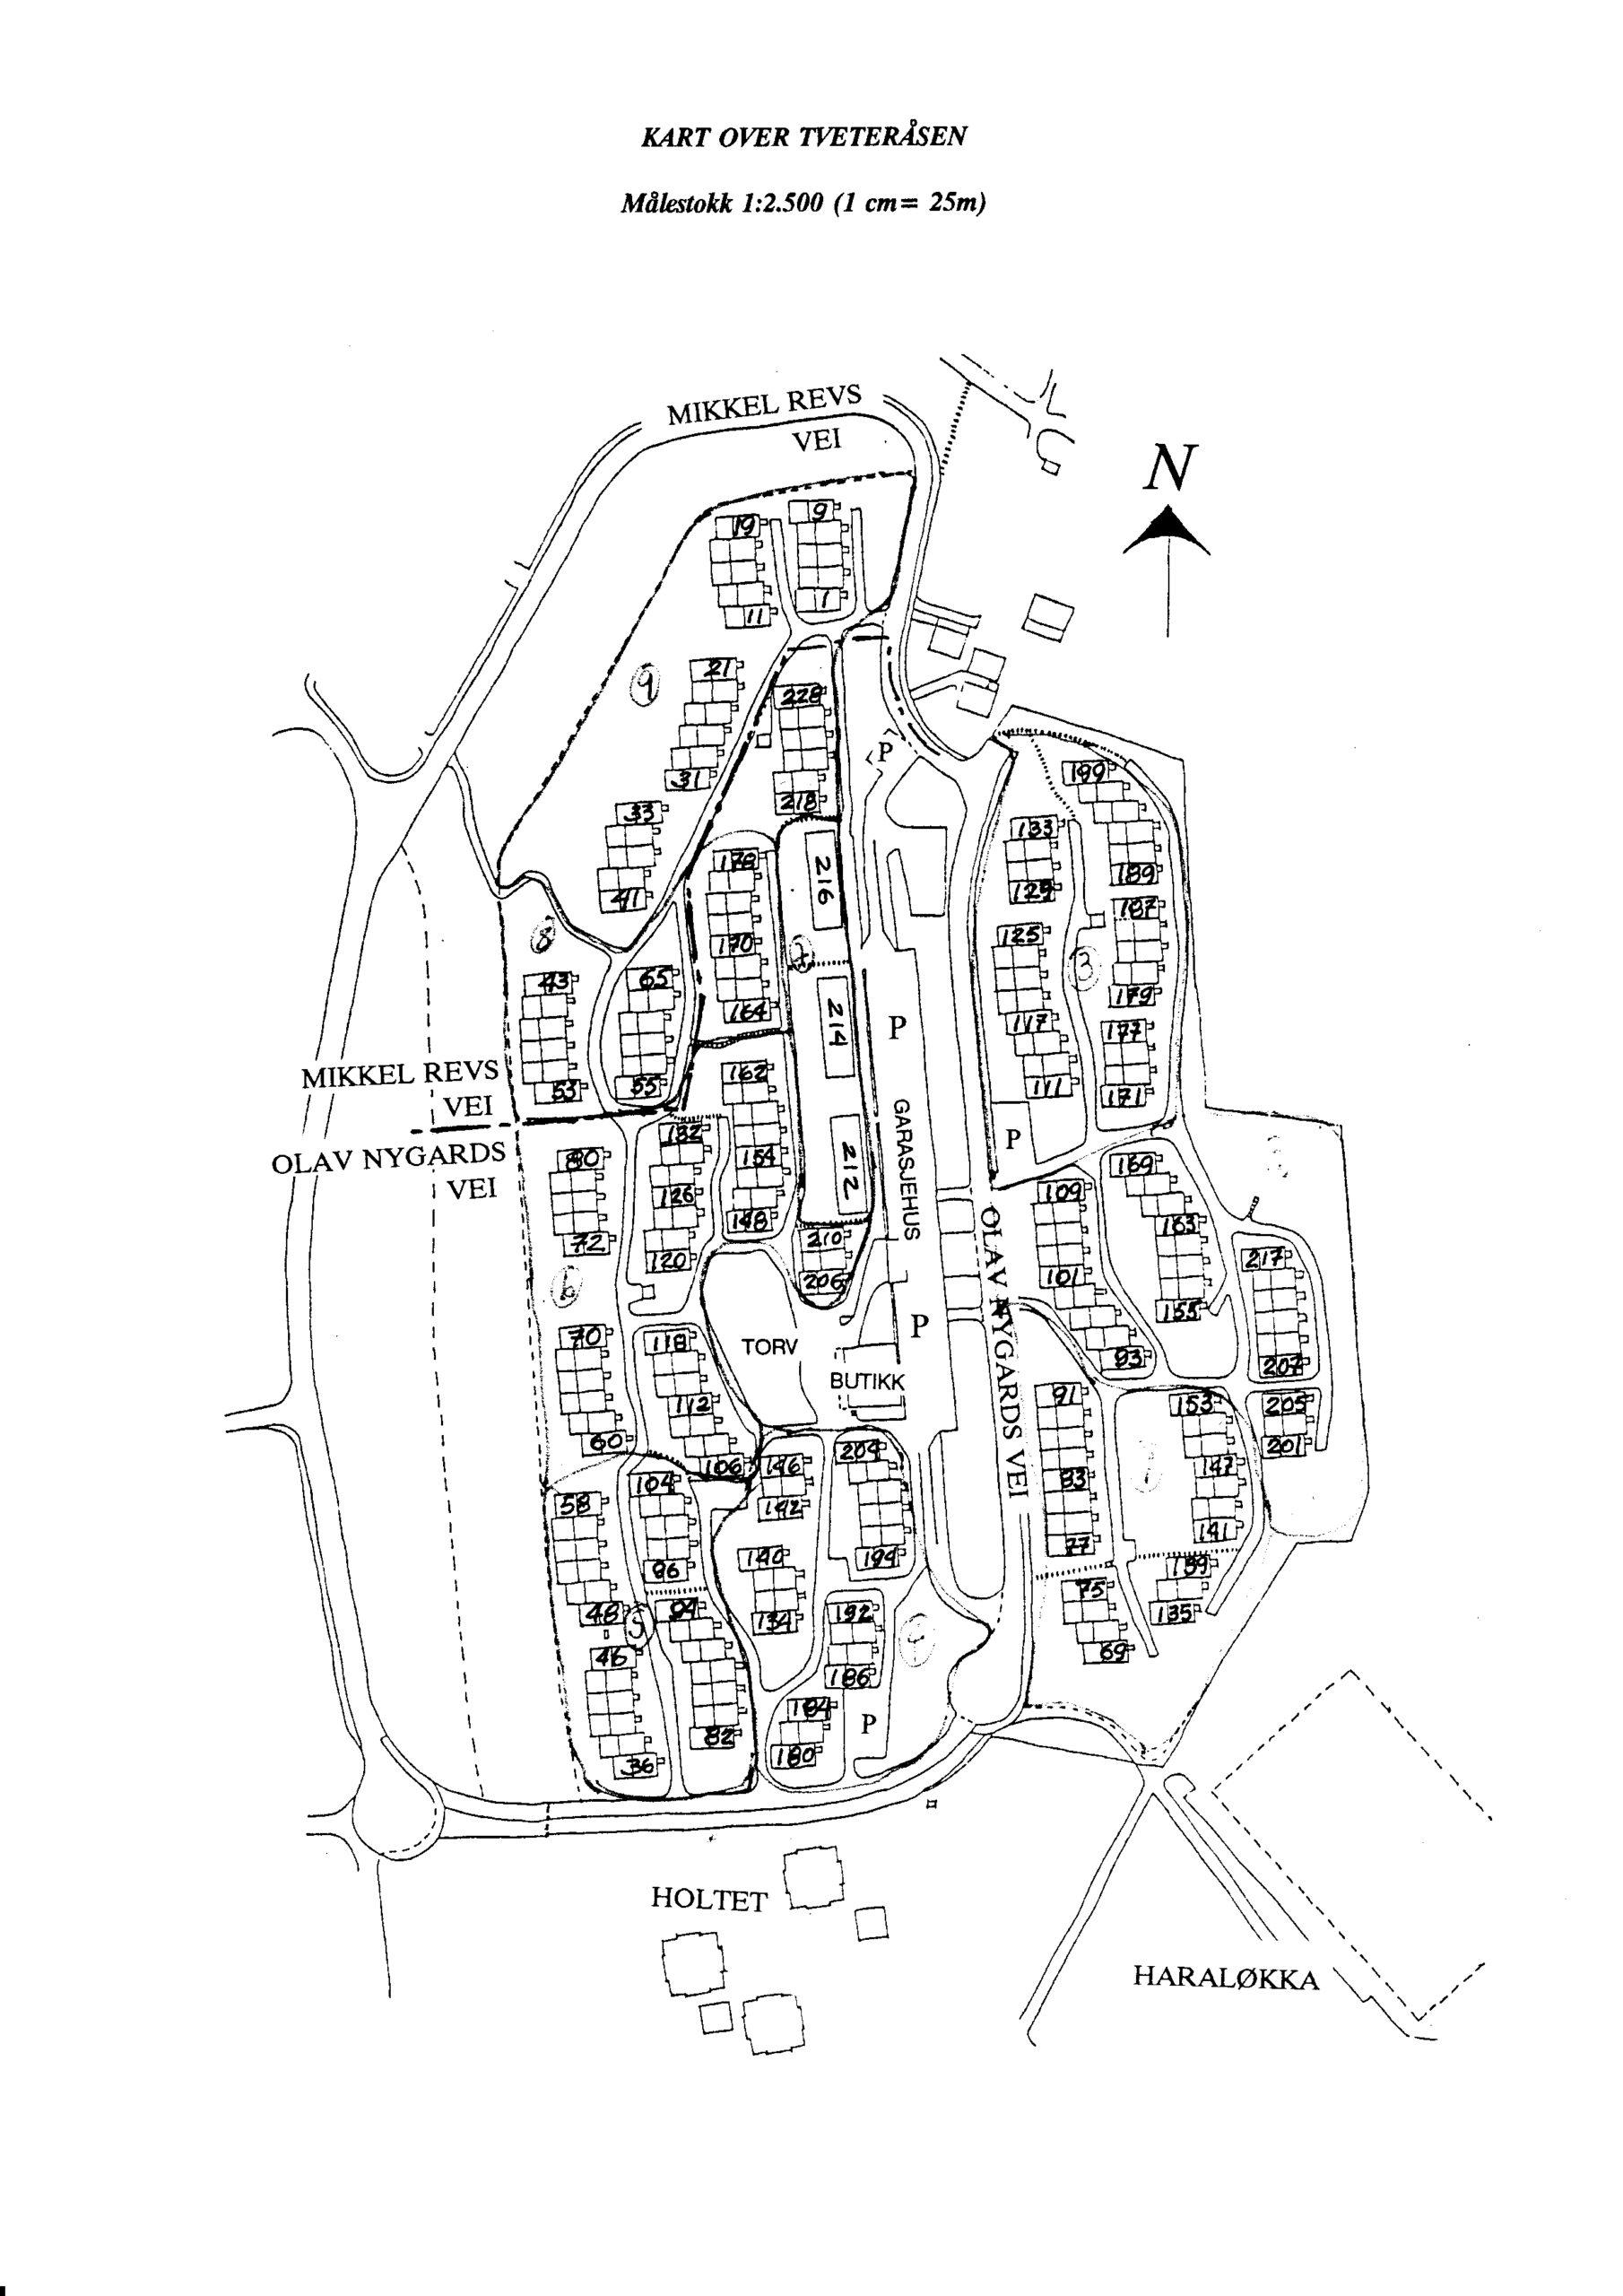 Kart Tveteråsen